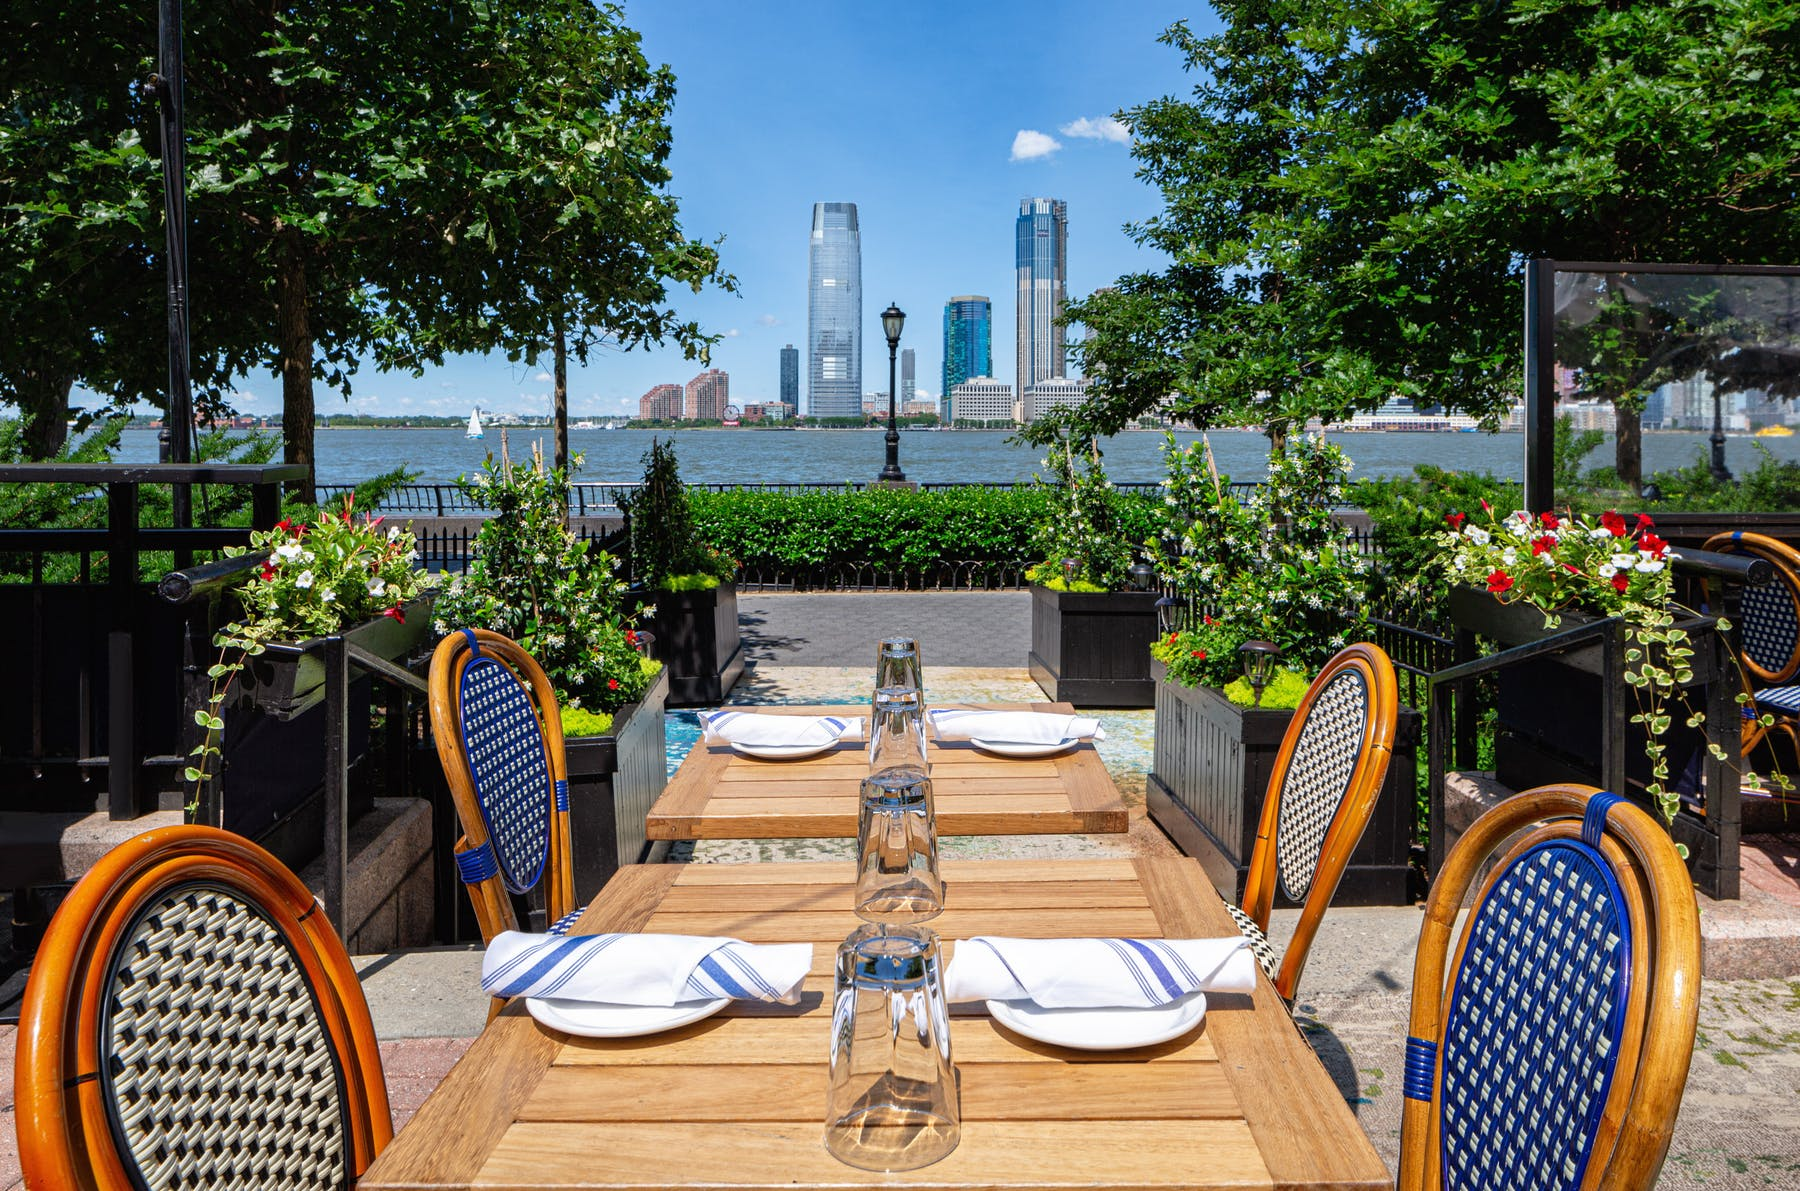 Merchants Riverhouse | Merchants River House | American Bistro in New York City, NY